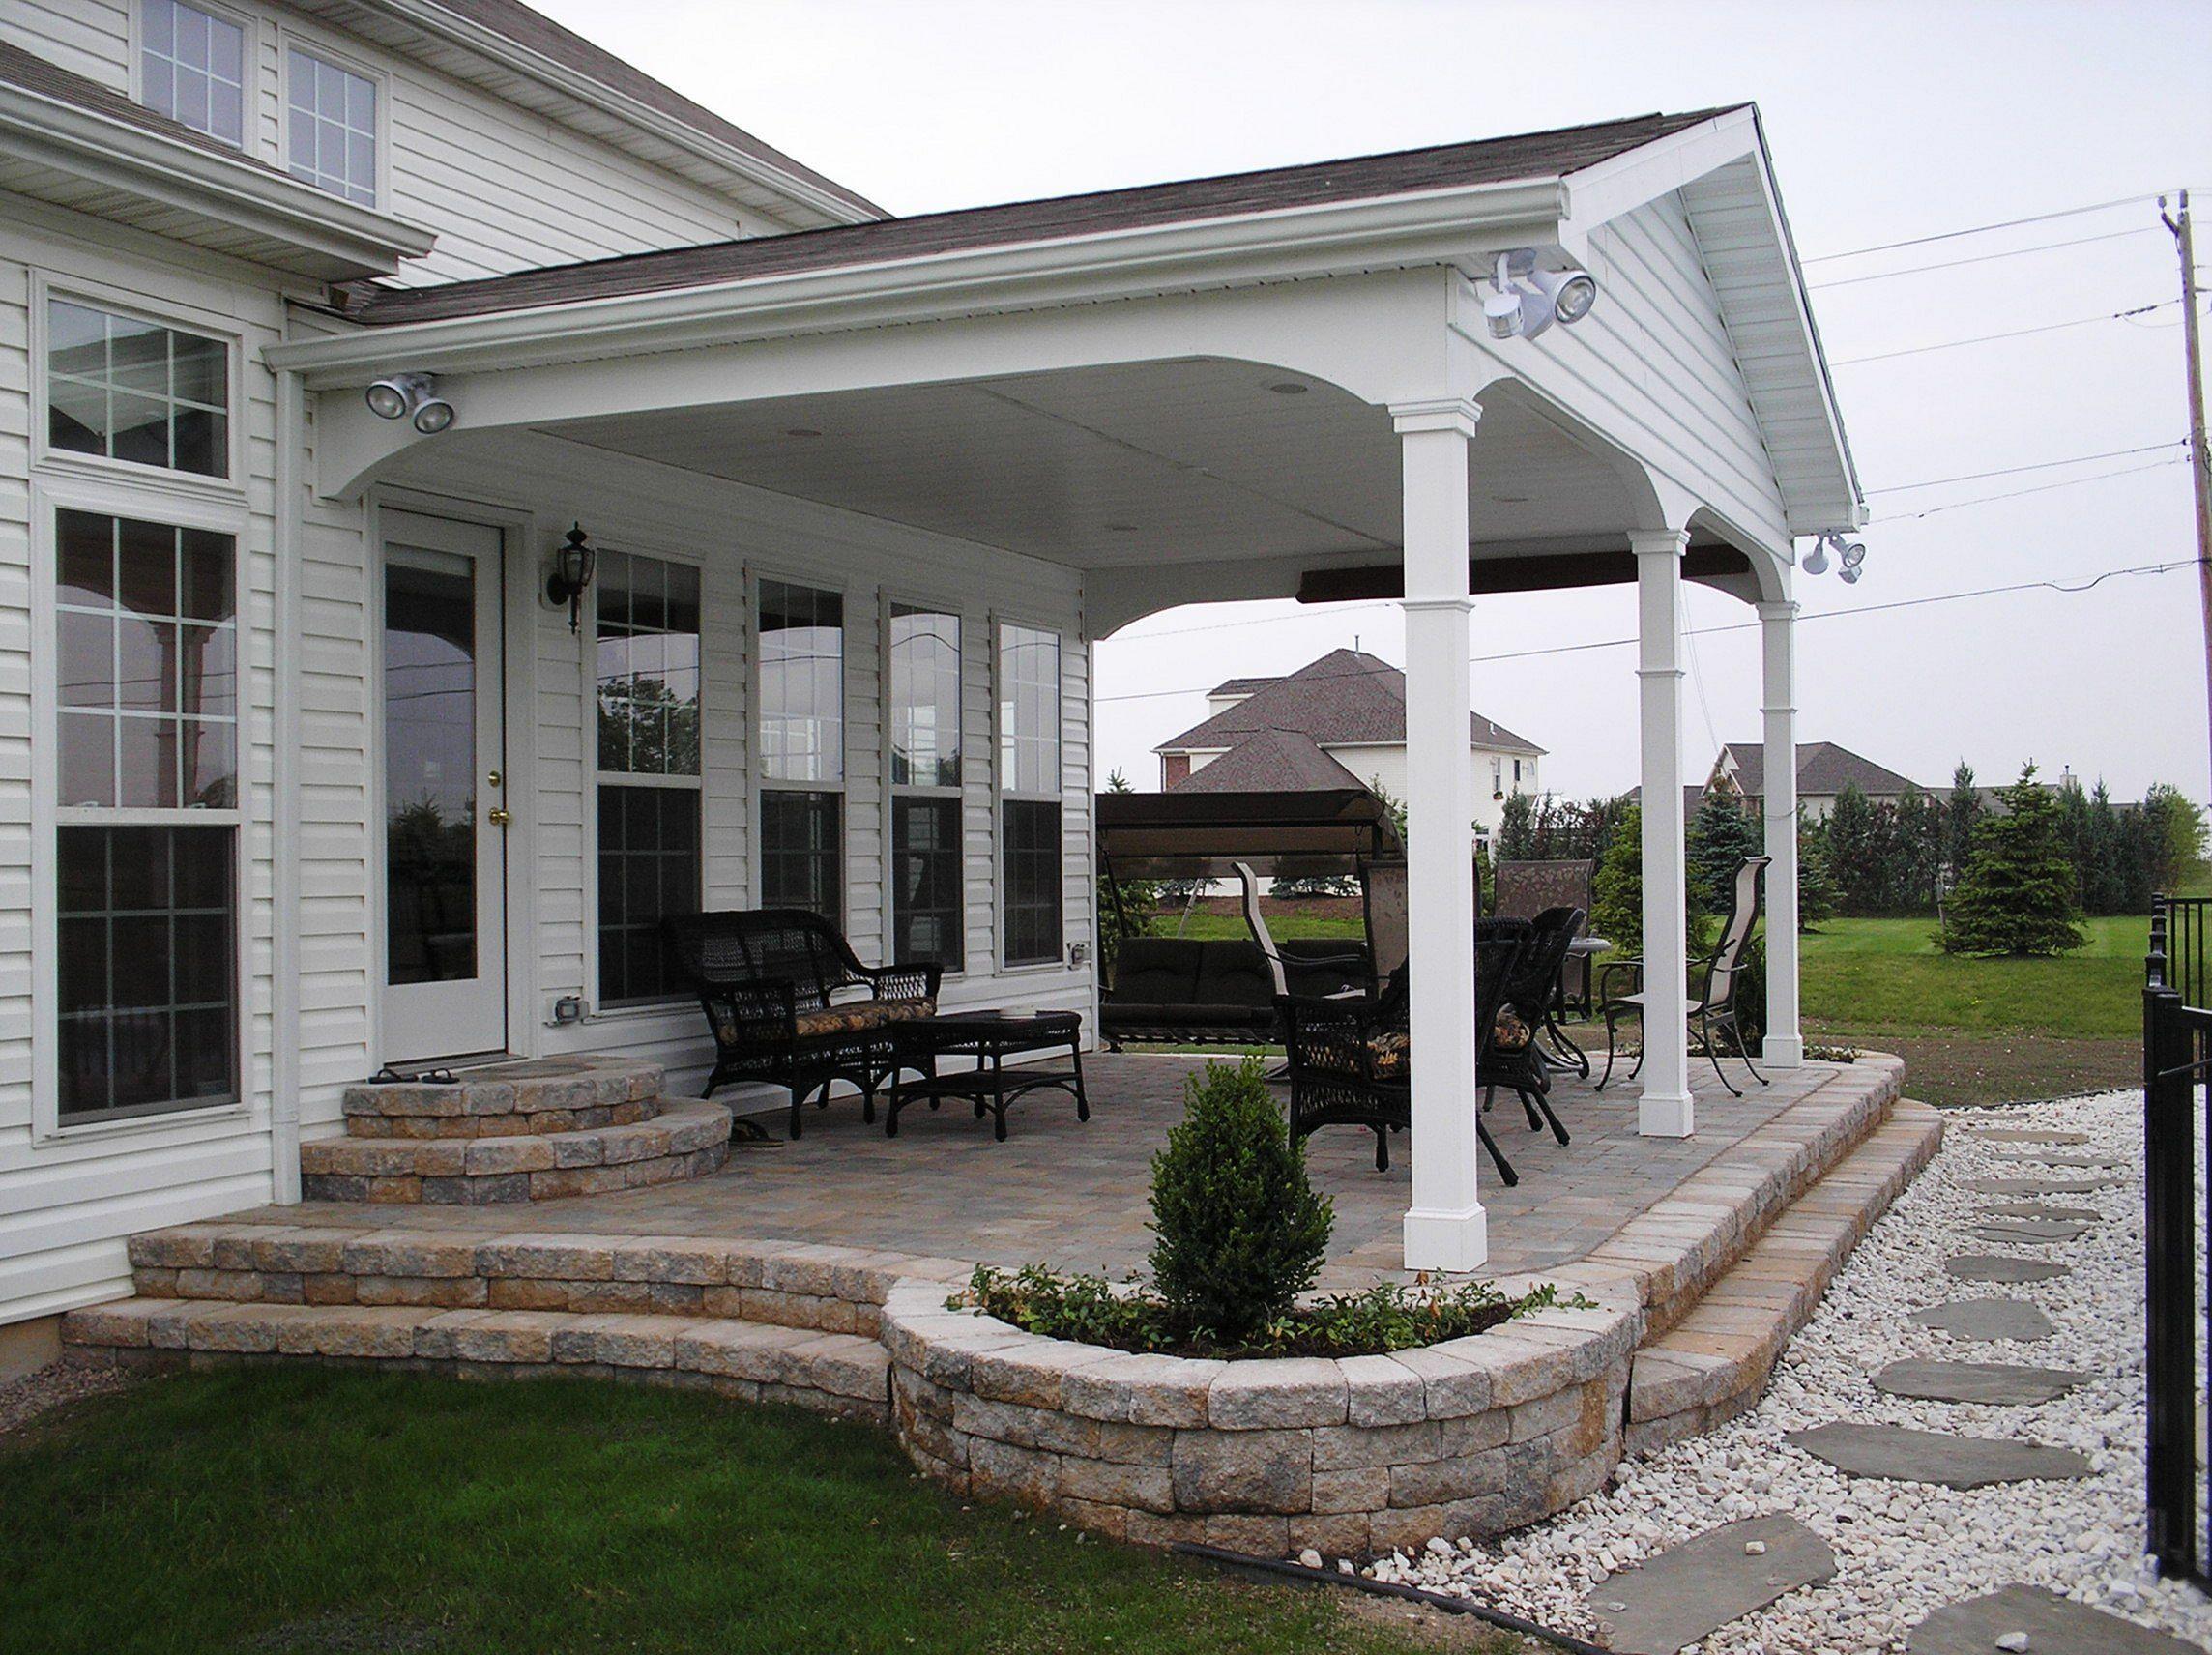 Majestic 30 Simple Back Porch Design For Beautiful Home Back Views Https Decoredo Com 12761 30 Simple Back Backyard Porch Back Porch Designs Patio Addition